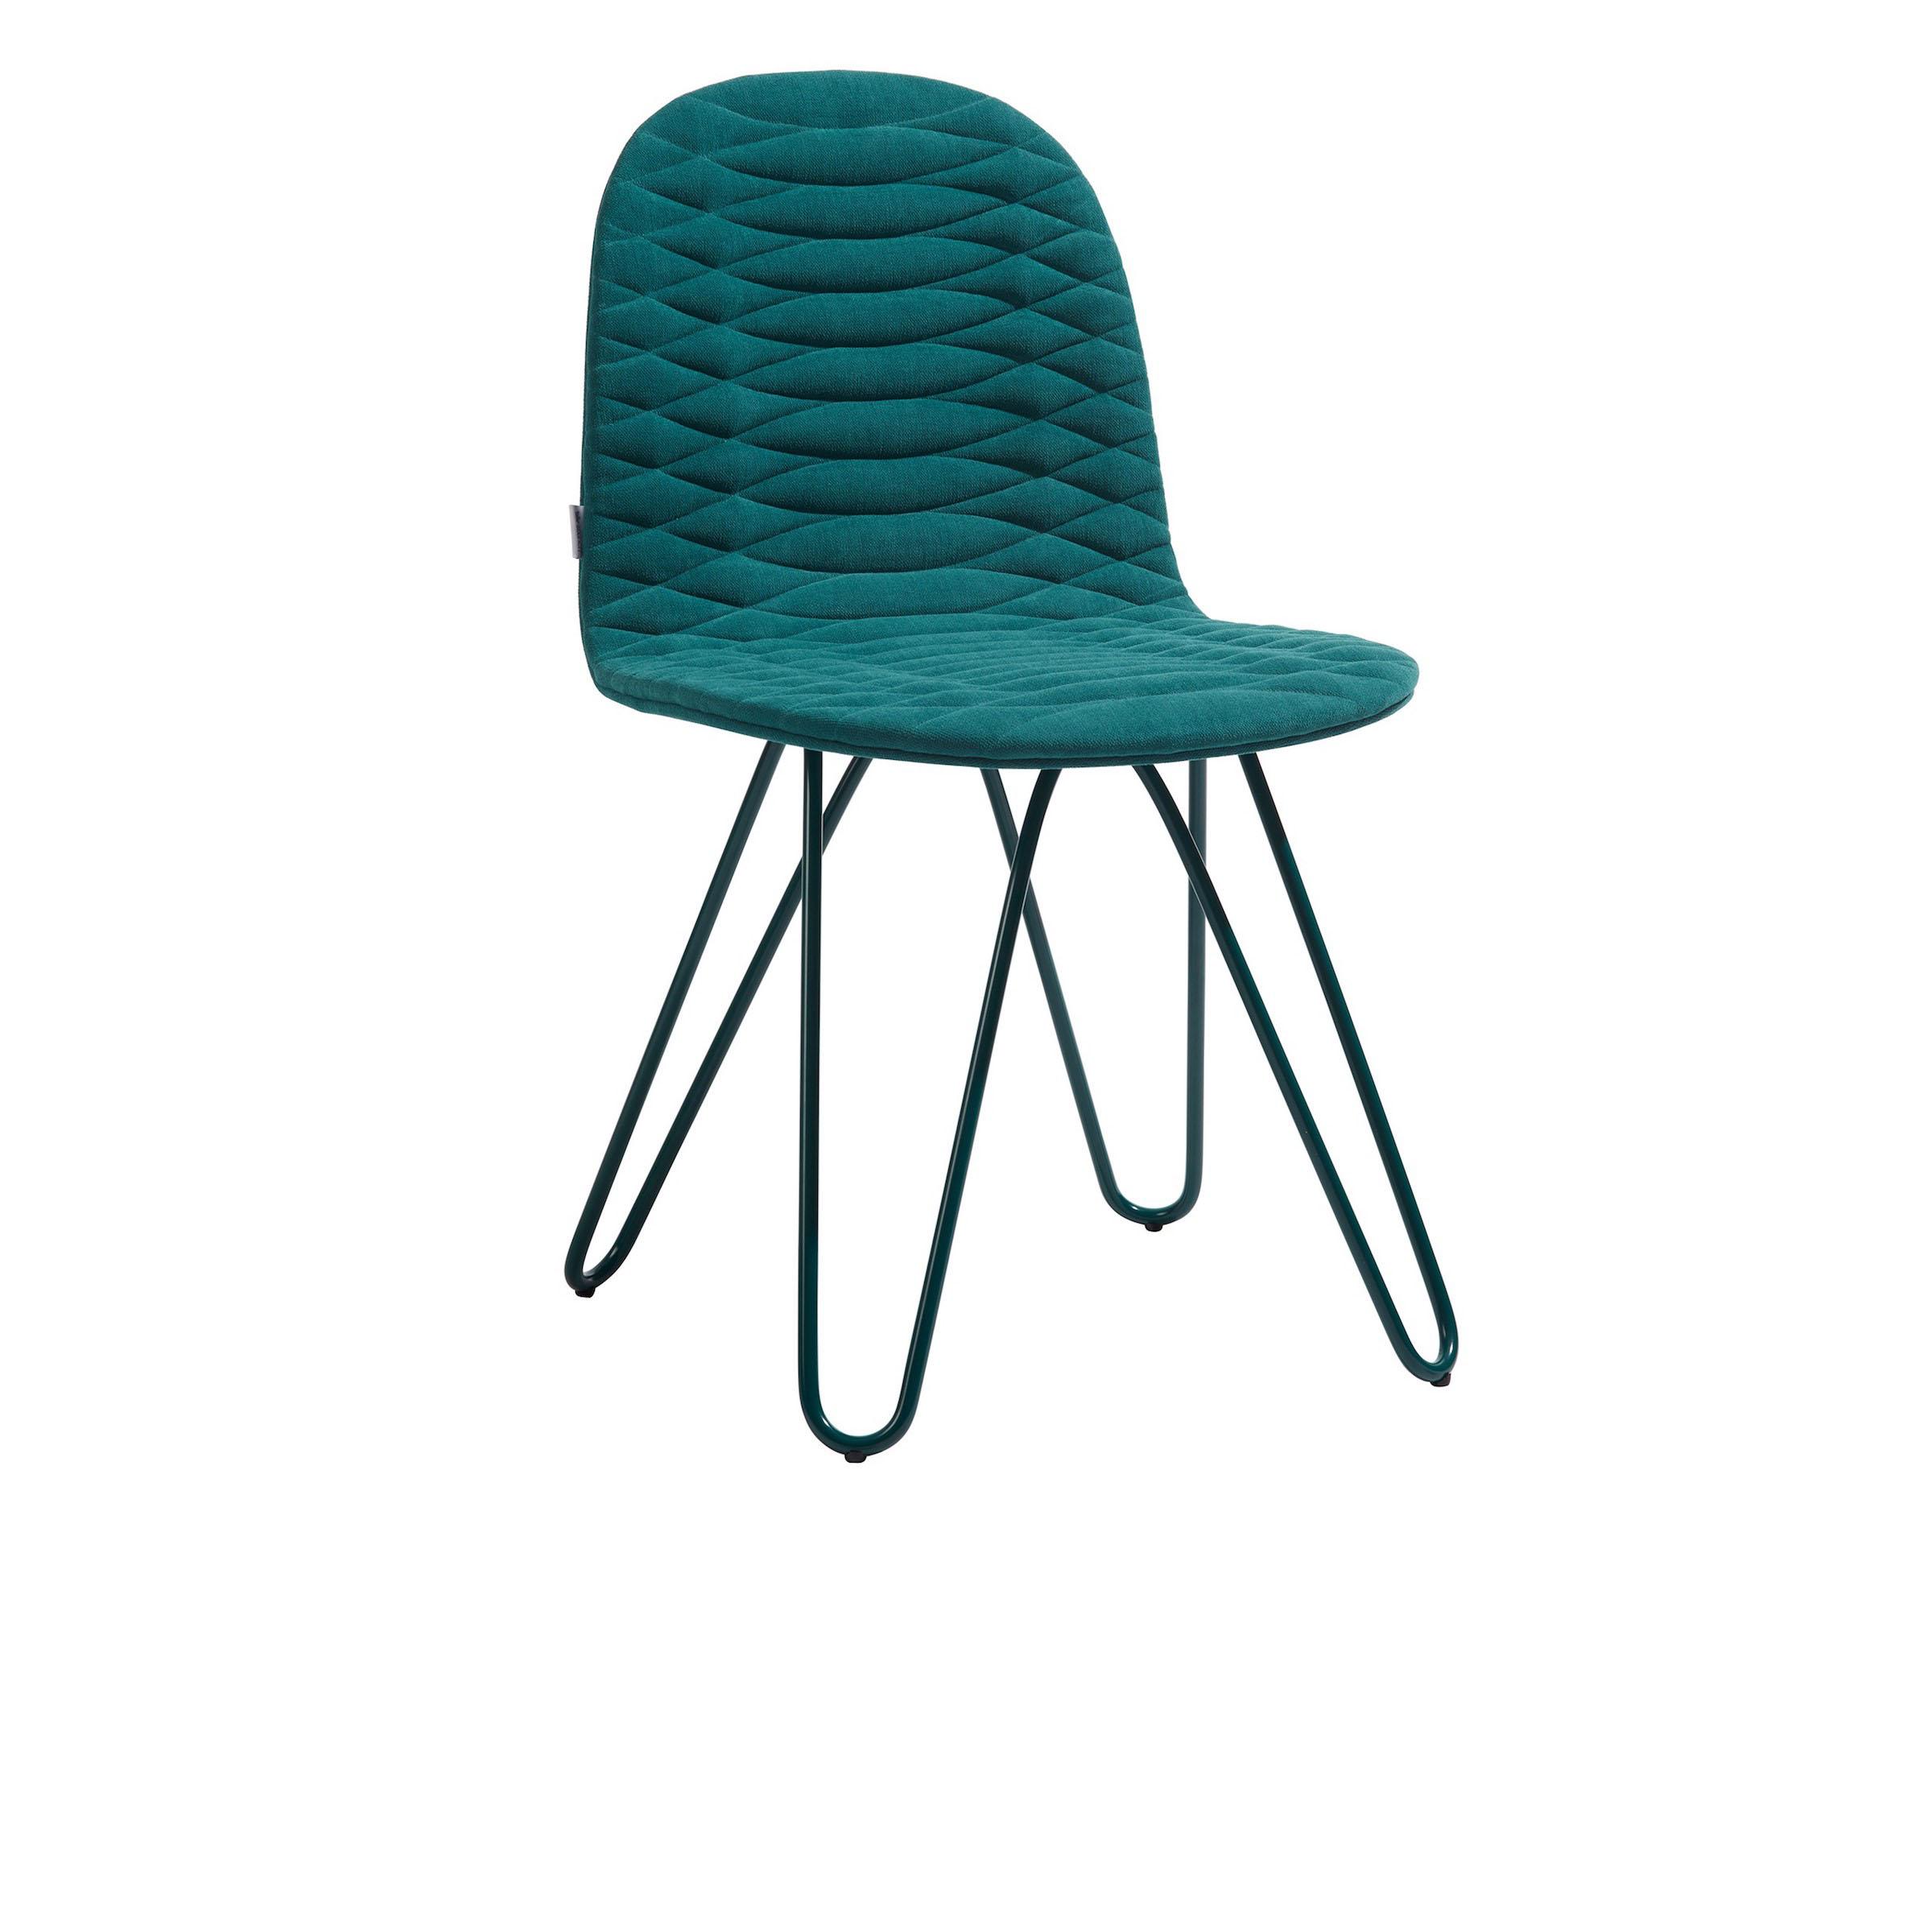 Template chair - Metal